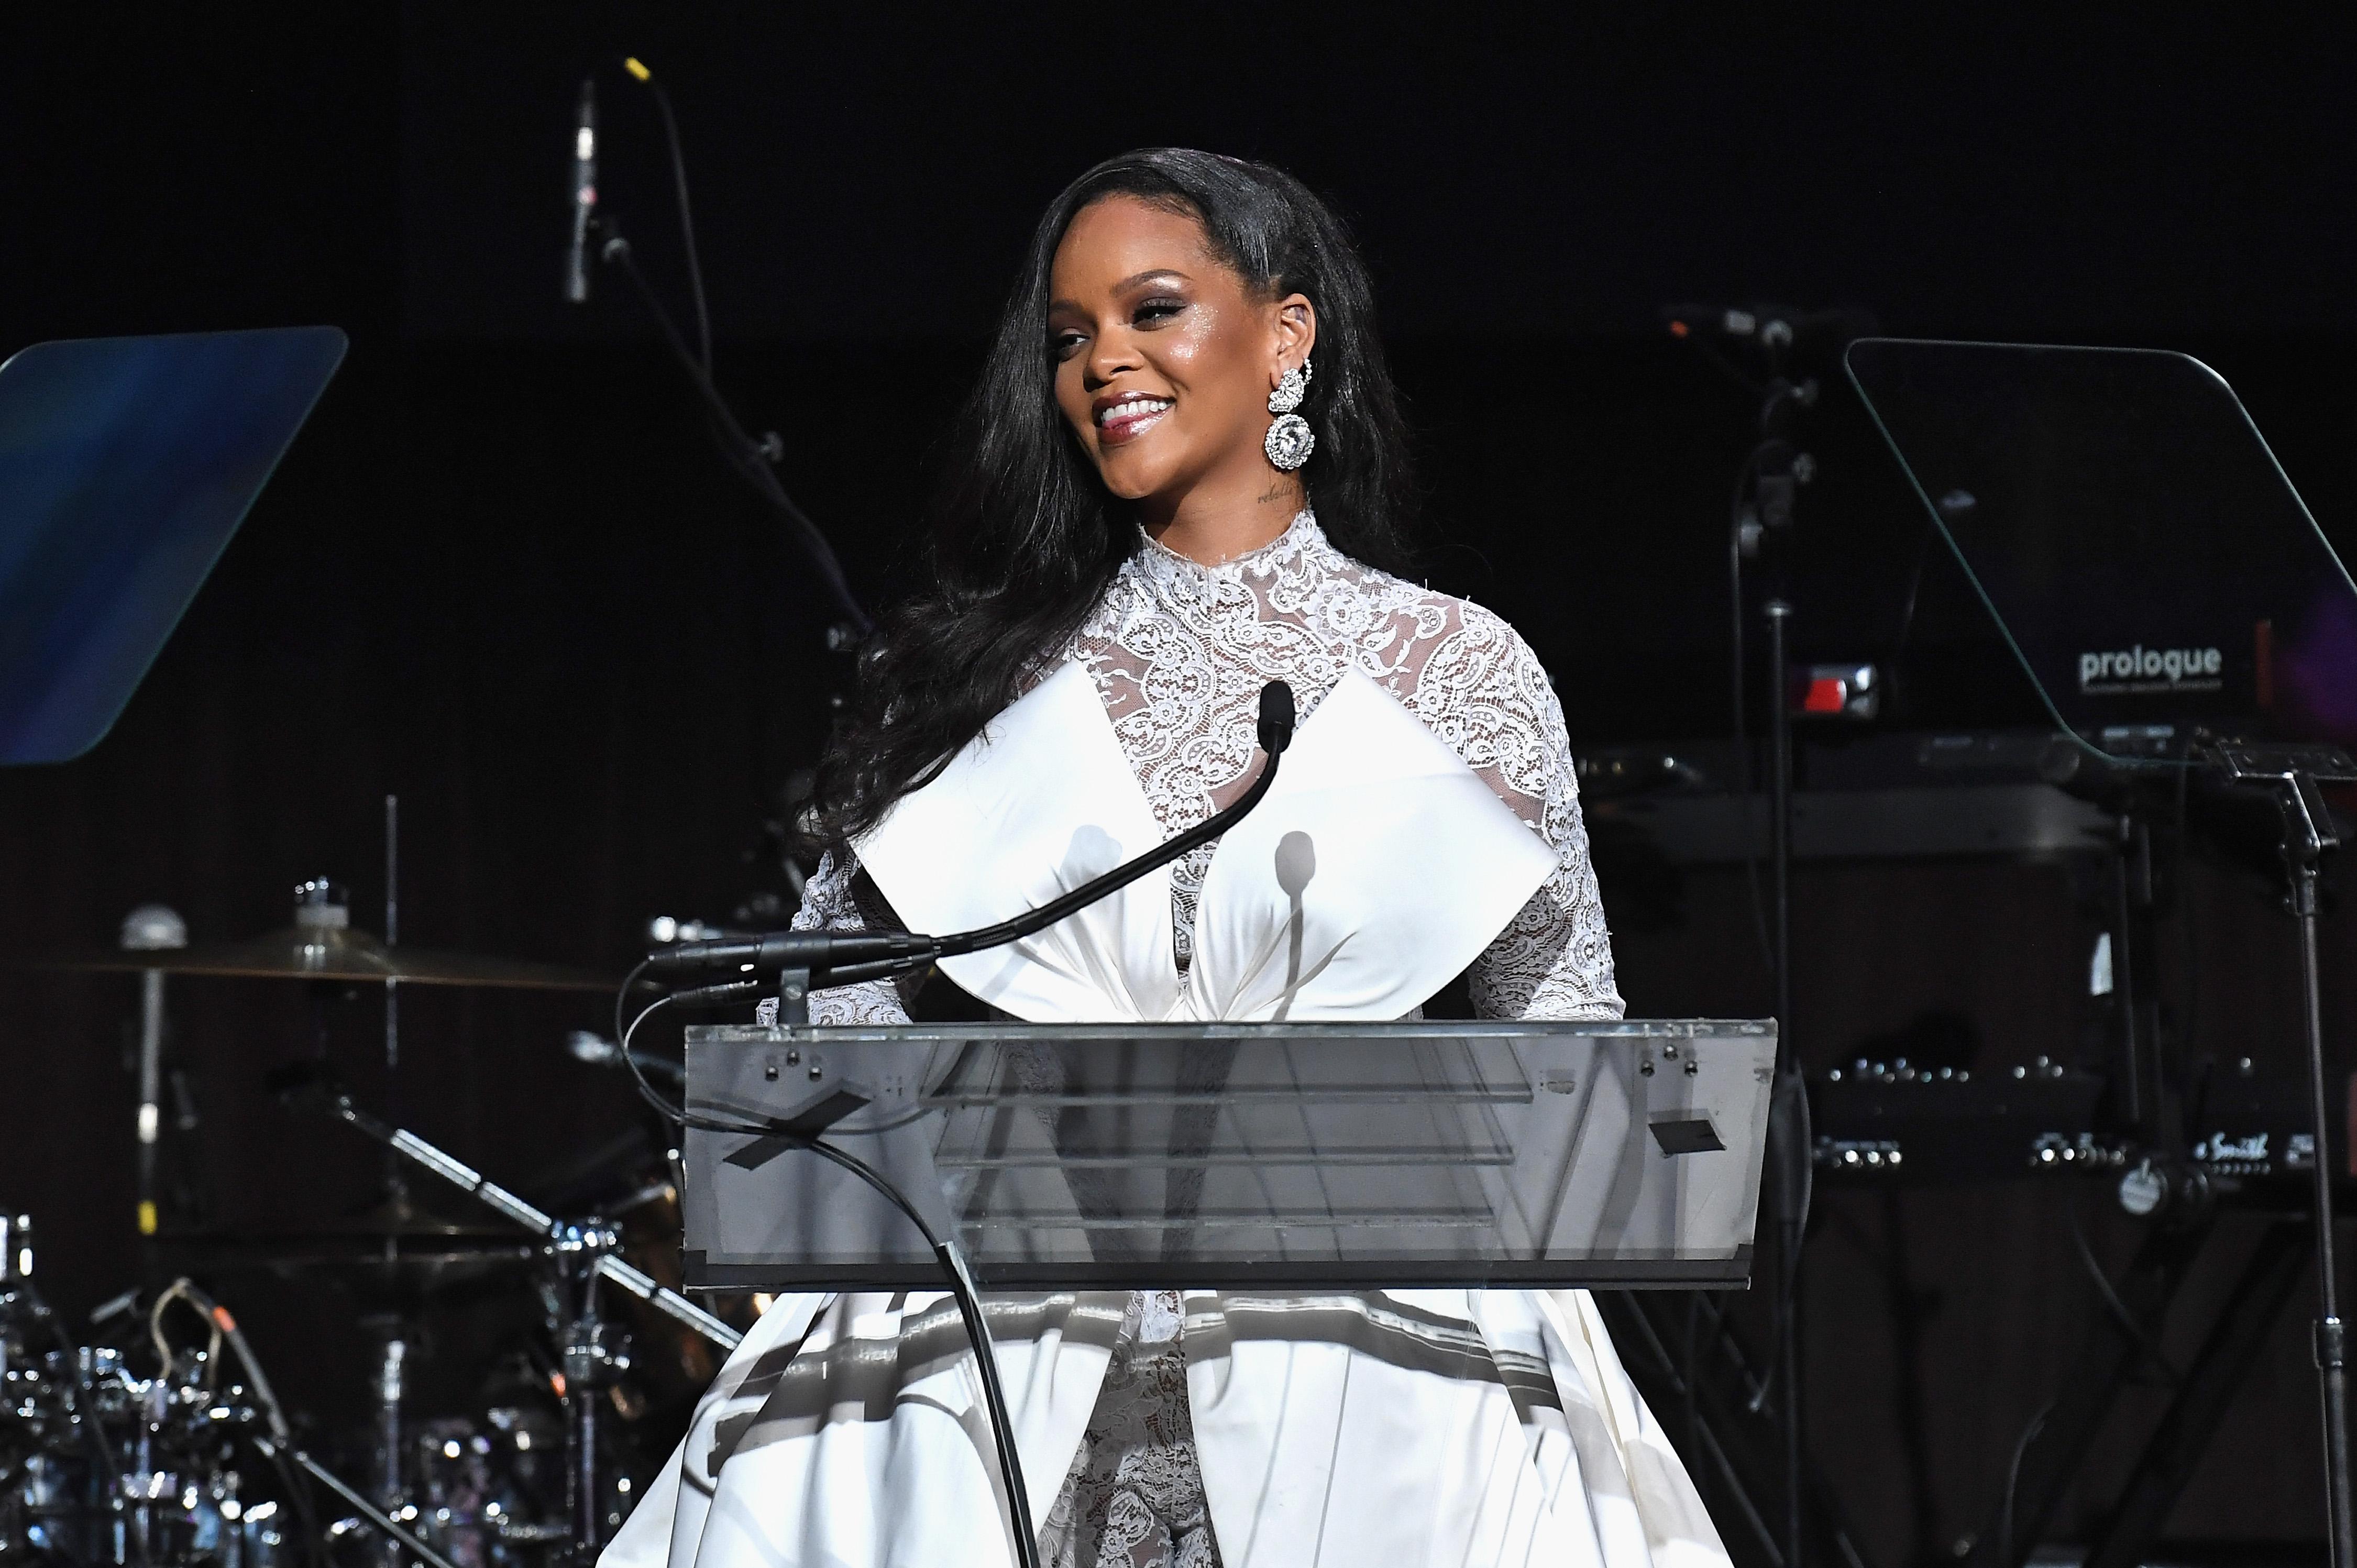 Inside Rihannas 2018 Diamond Ball - Armand de Brignac Champagne